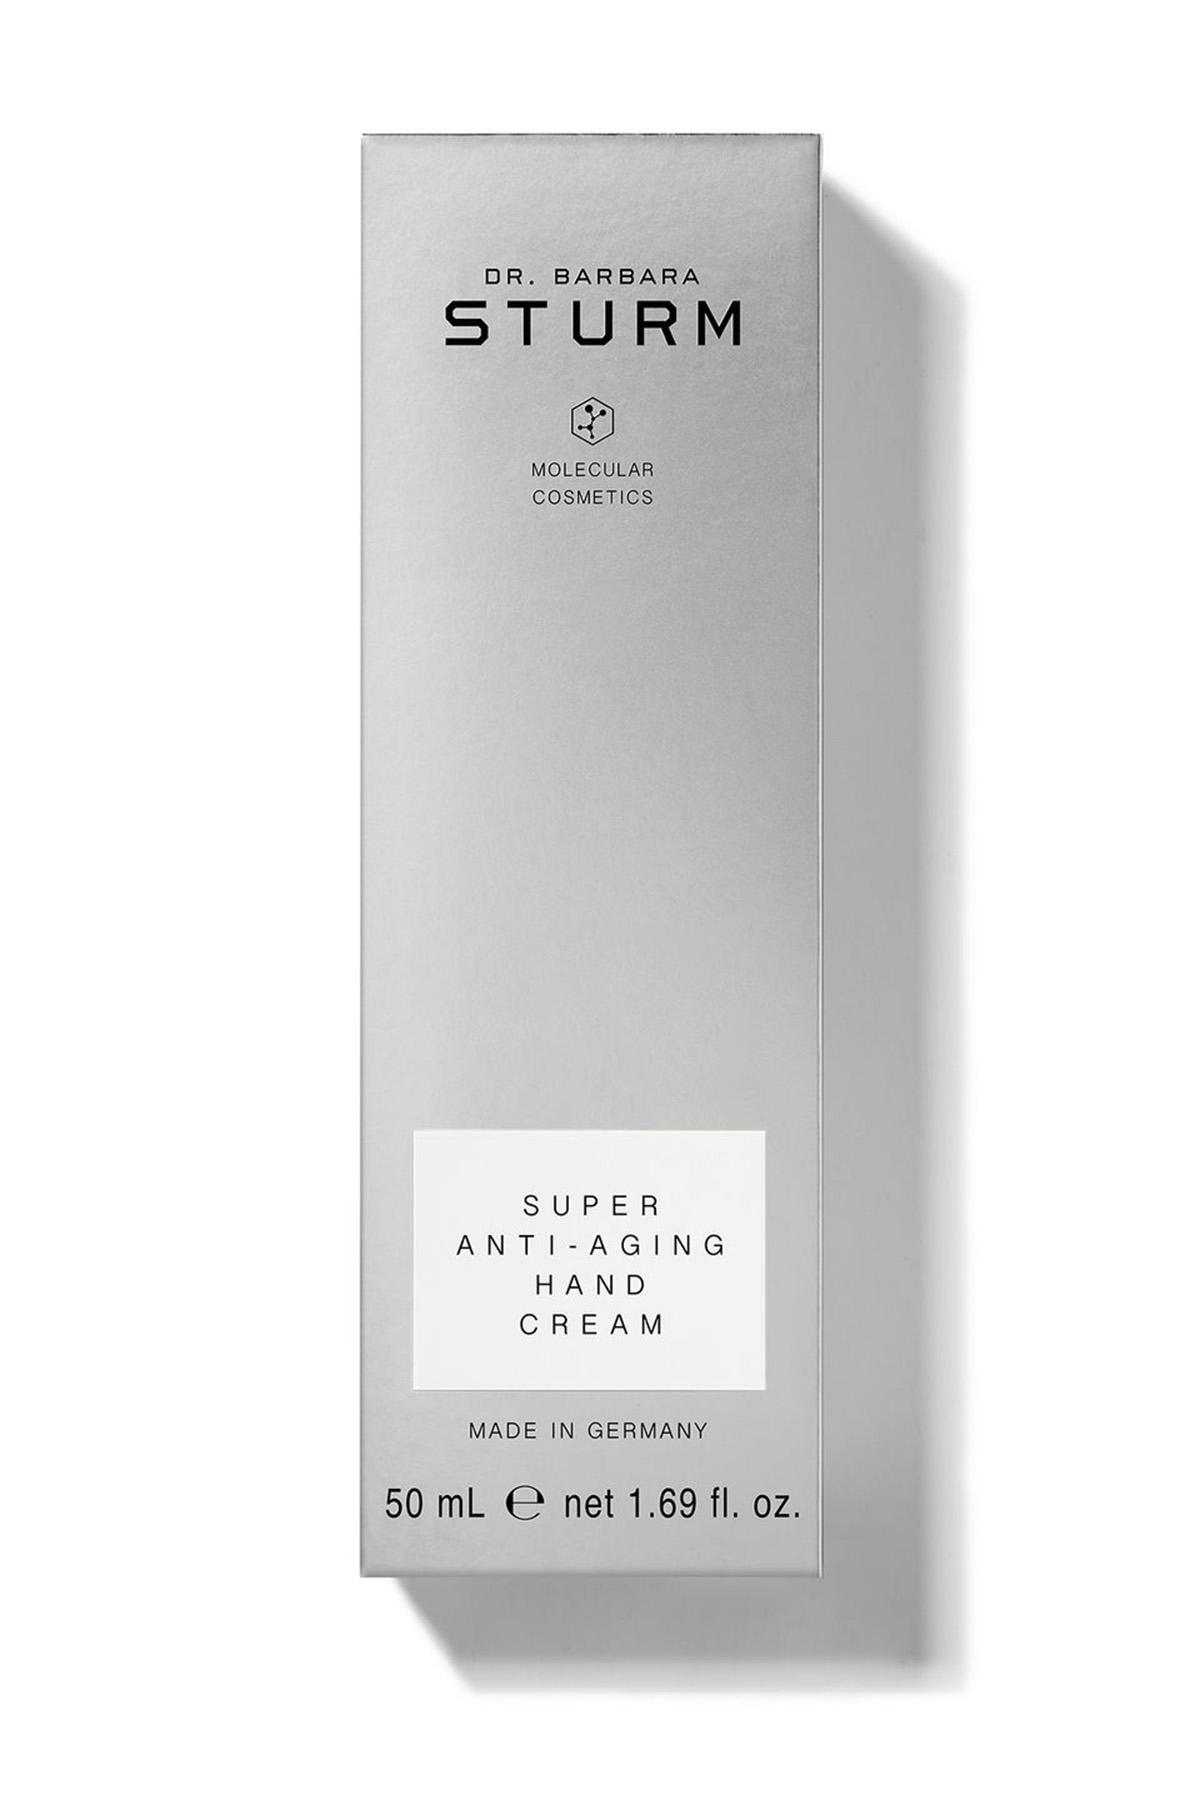 Dr barbara sturm beauty super anti aging hand cream 50 ml